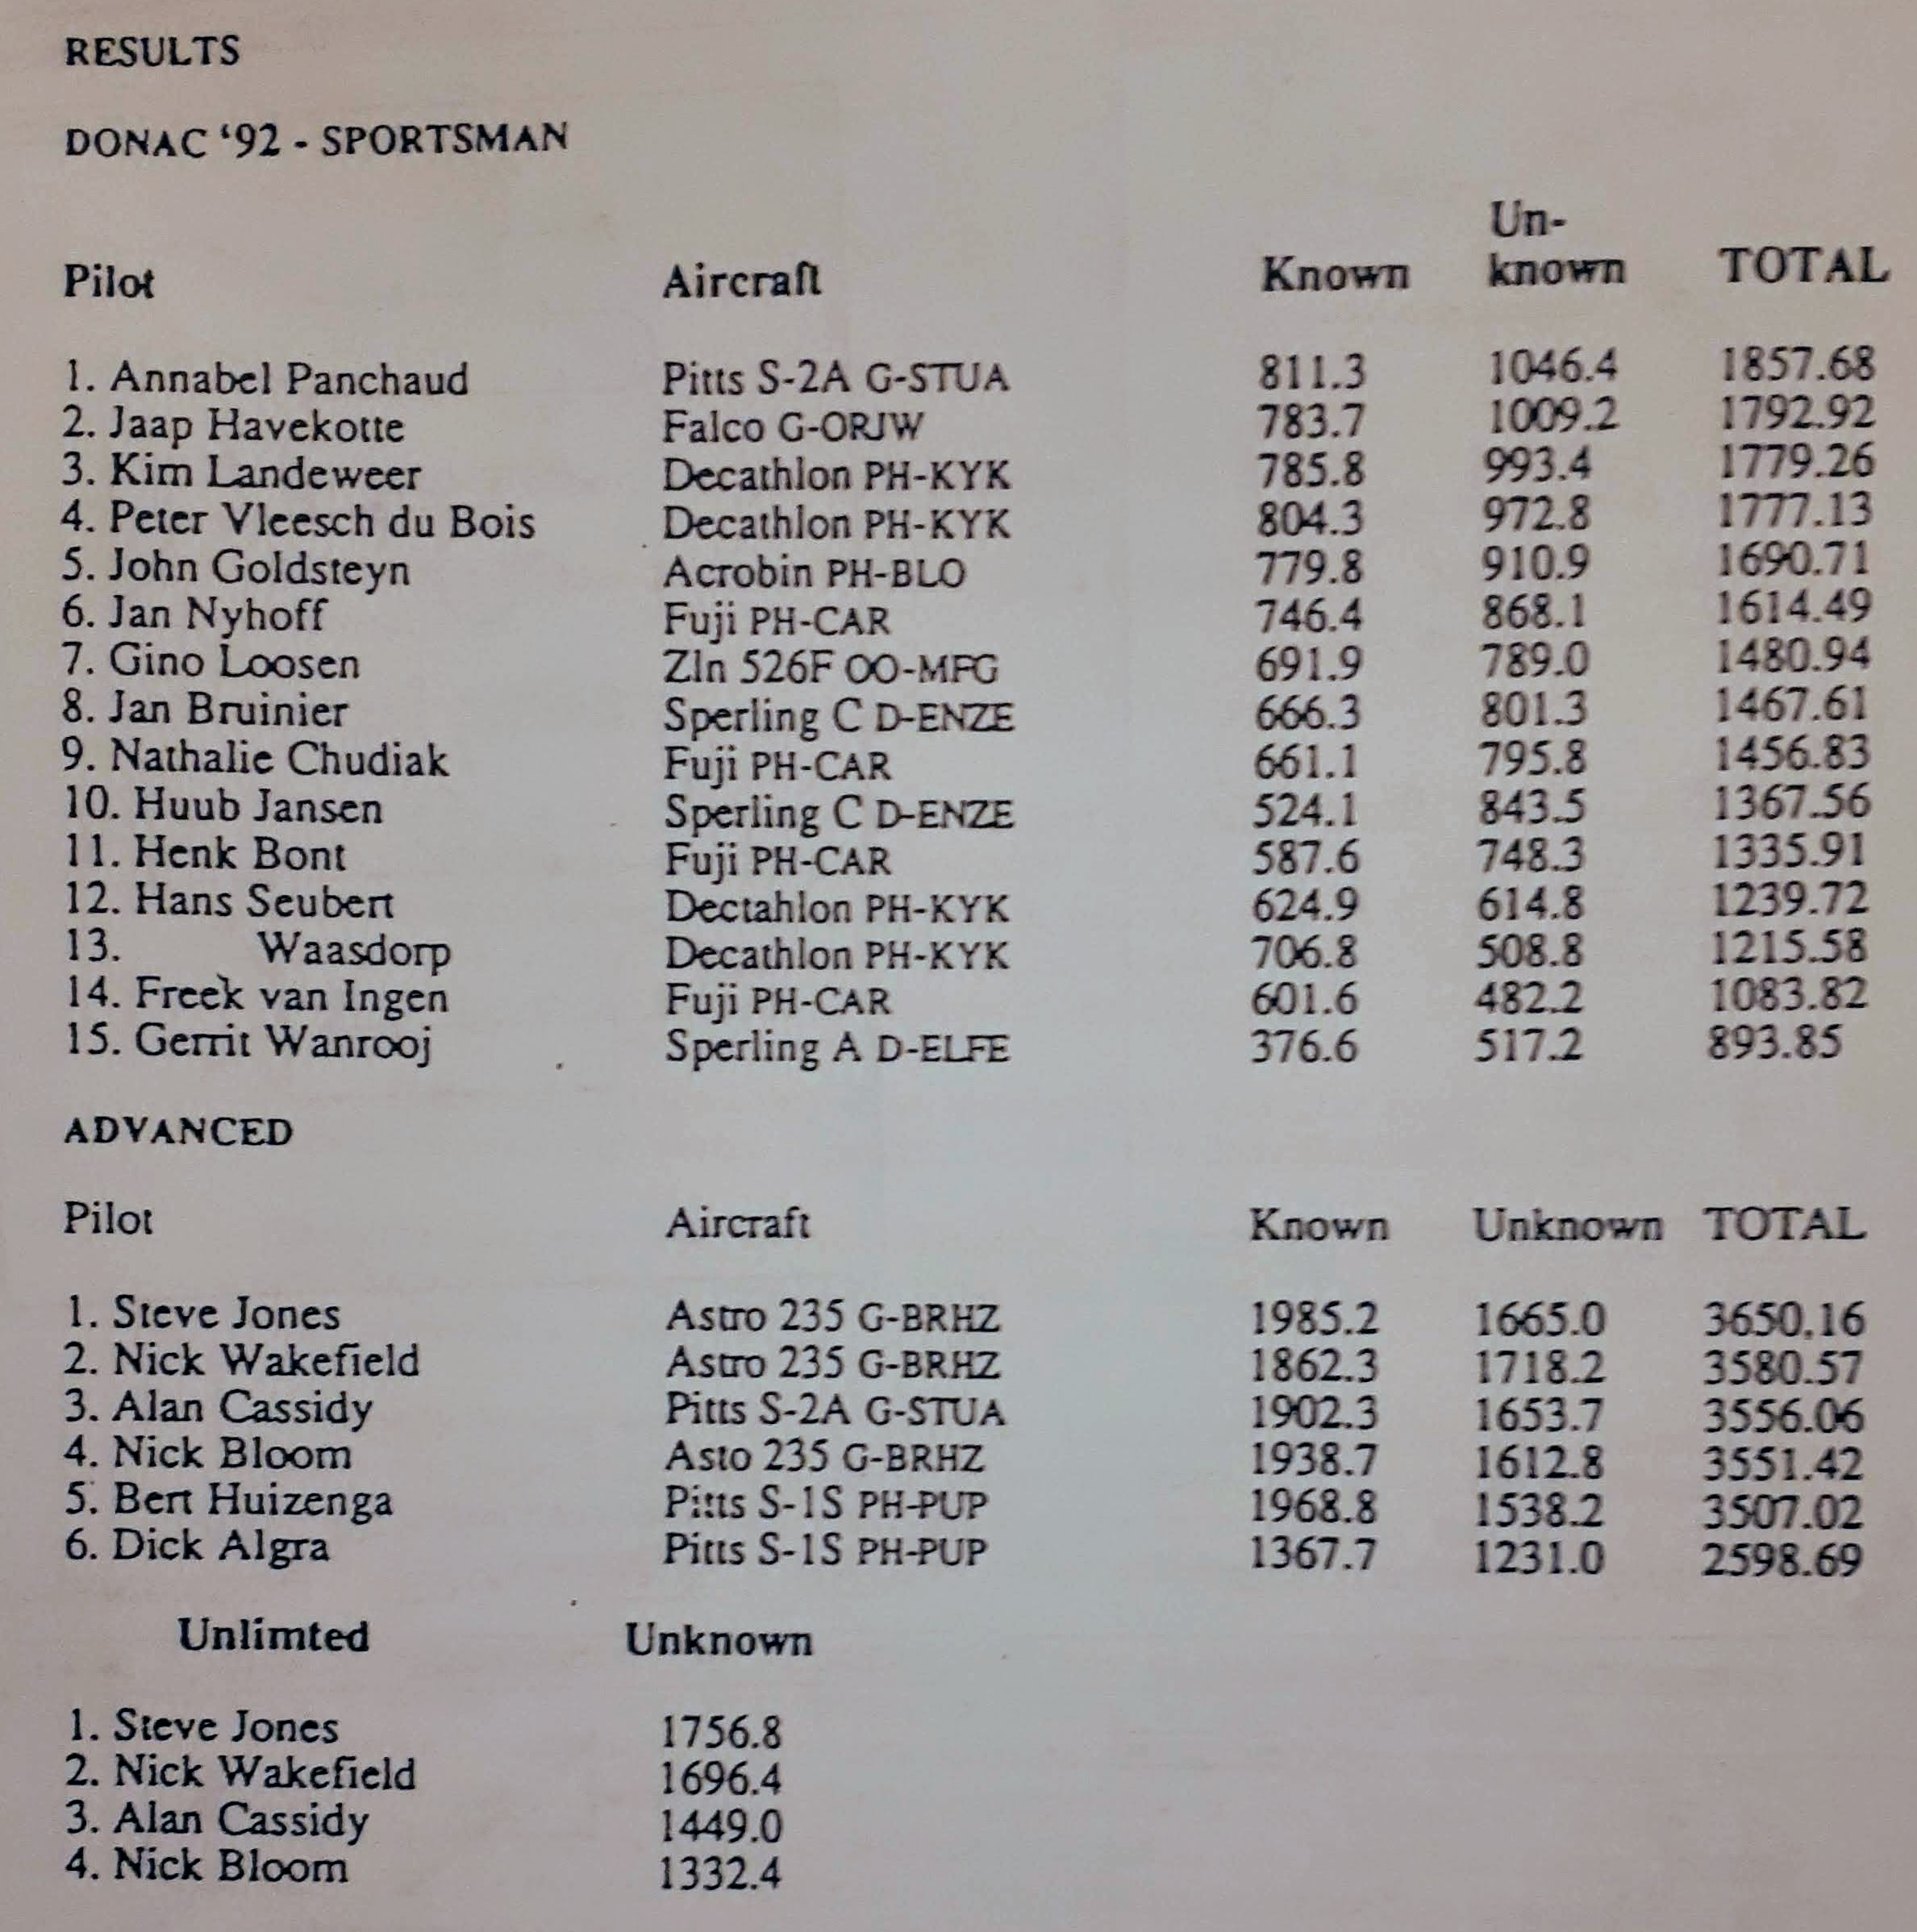 DONAC 1992 results